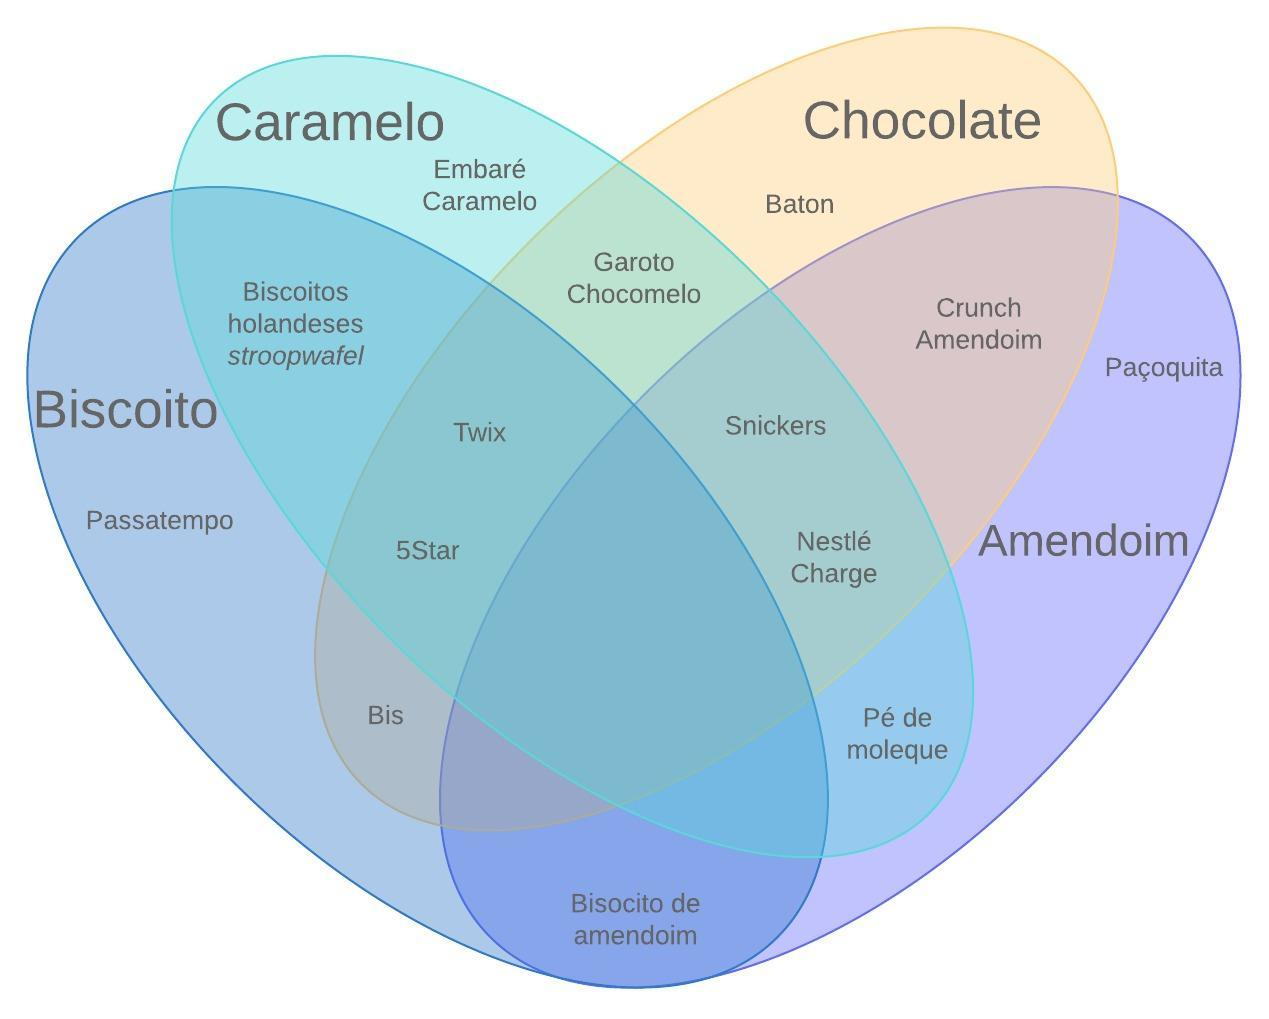 Diagrama de Venn com 4 conjuntos